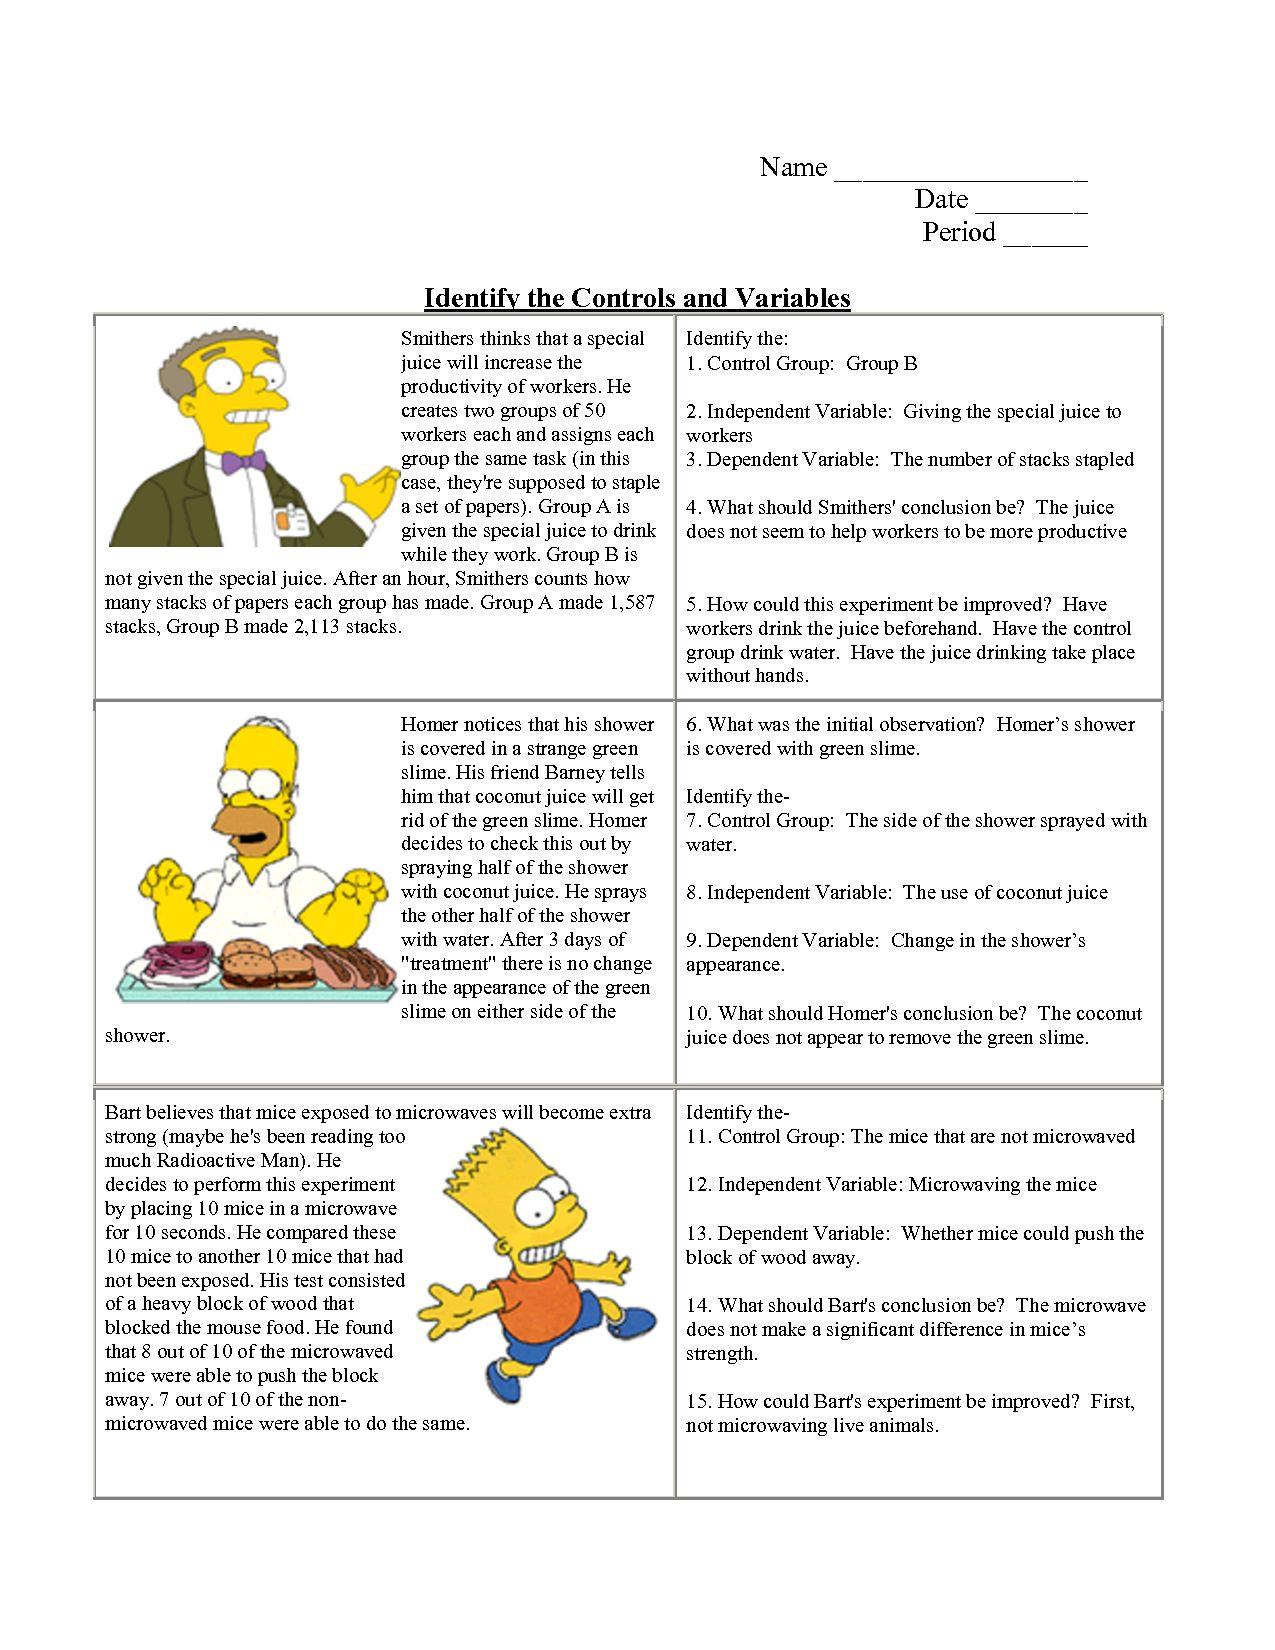 Skills Worksheet Critical Thinking Analogies